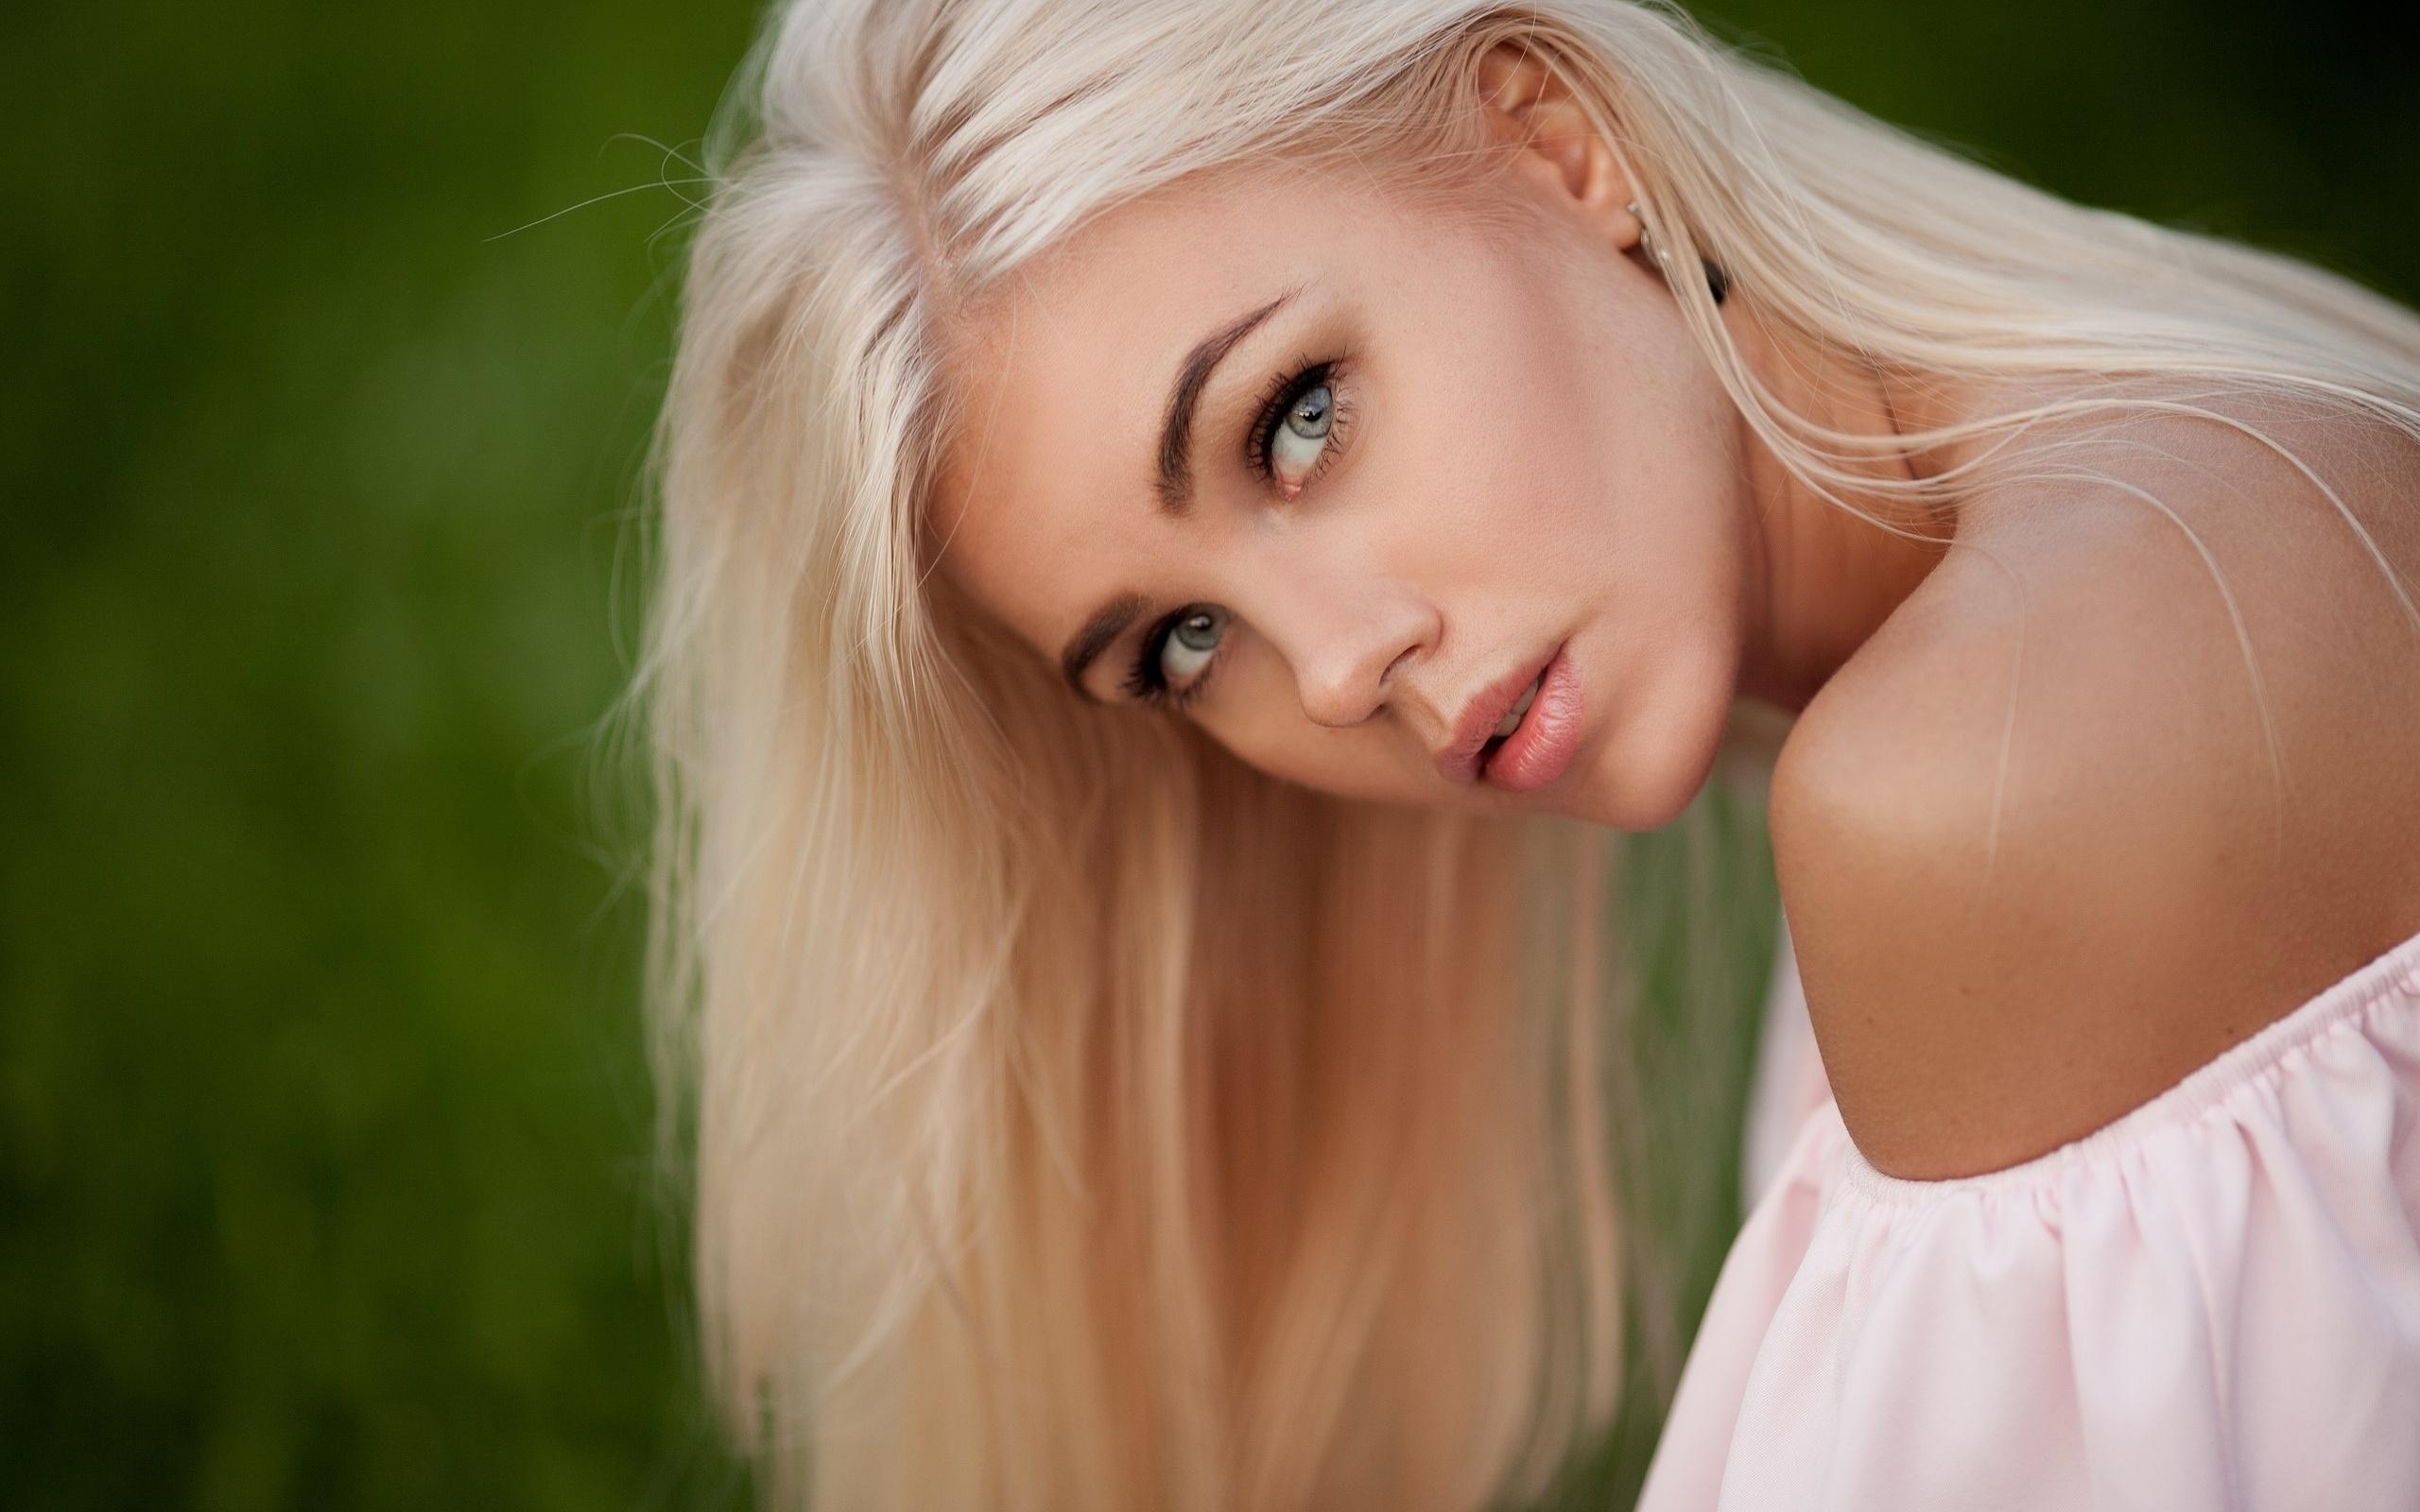 Февраля, картинки девушки блондинки